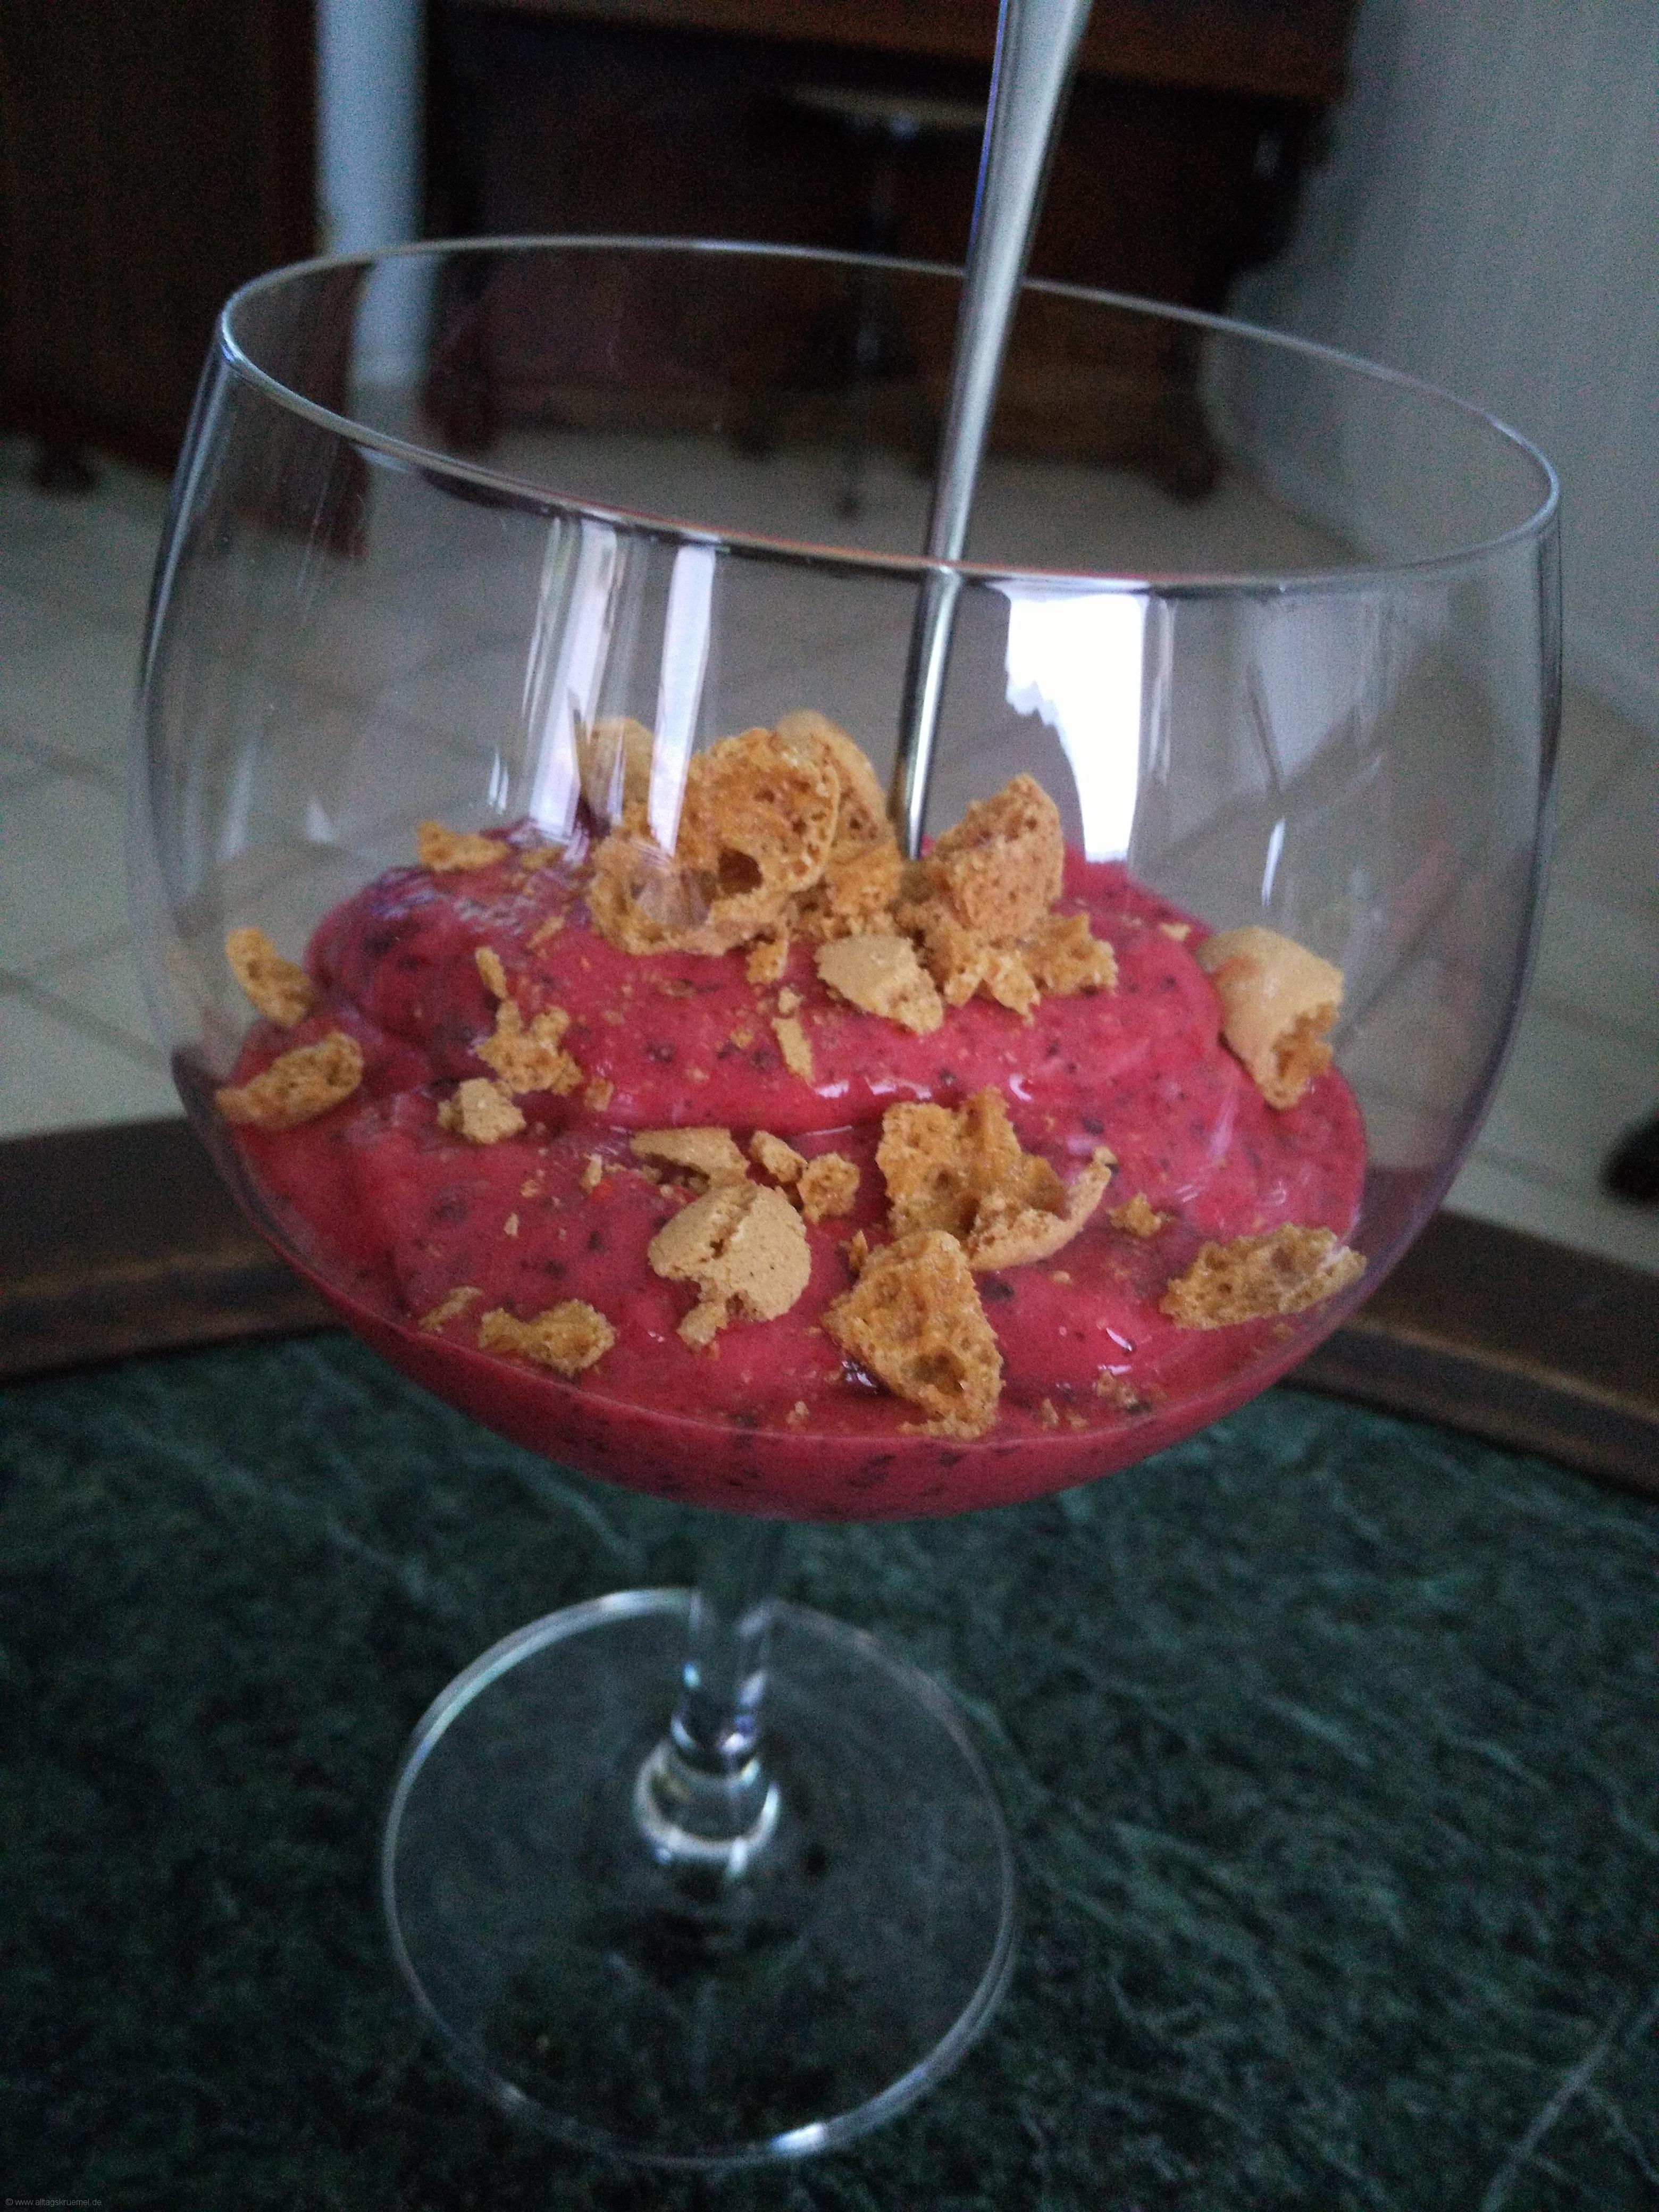 Fruchtiges Dessert: Erdbeeren Himbeeren, Banane - gefroren und püriert